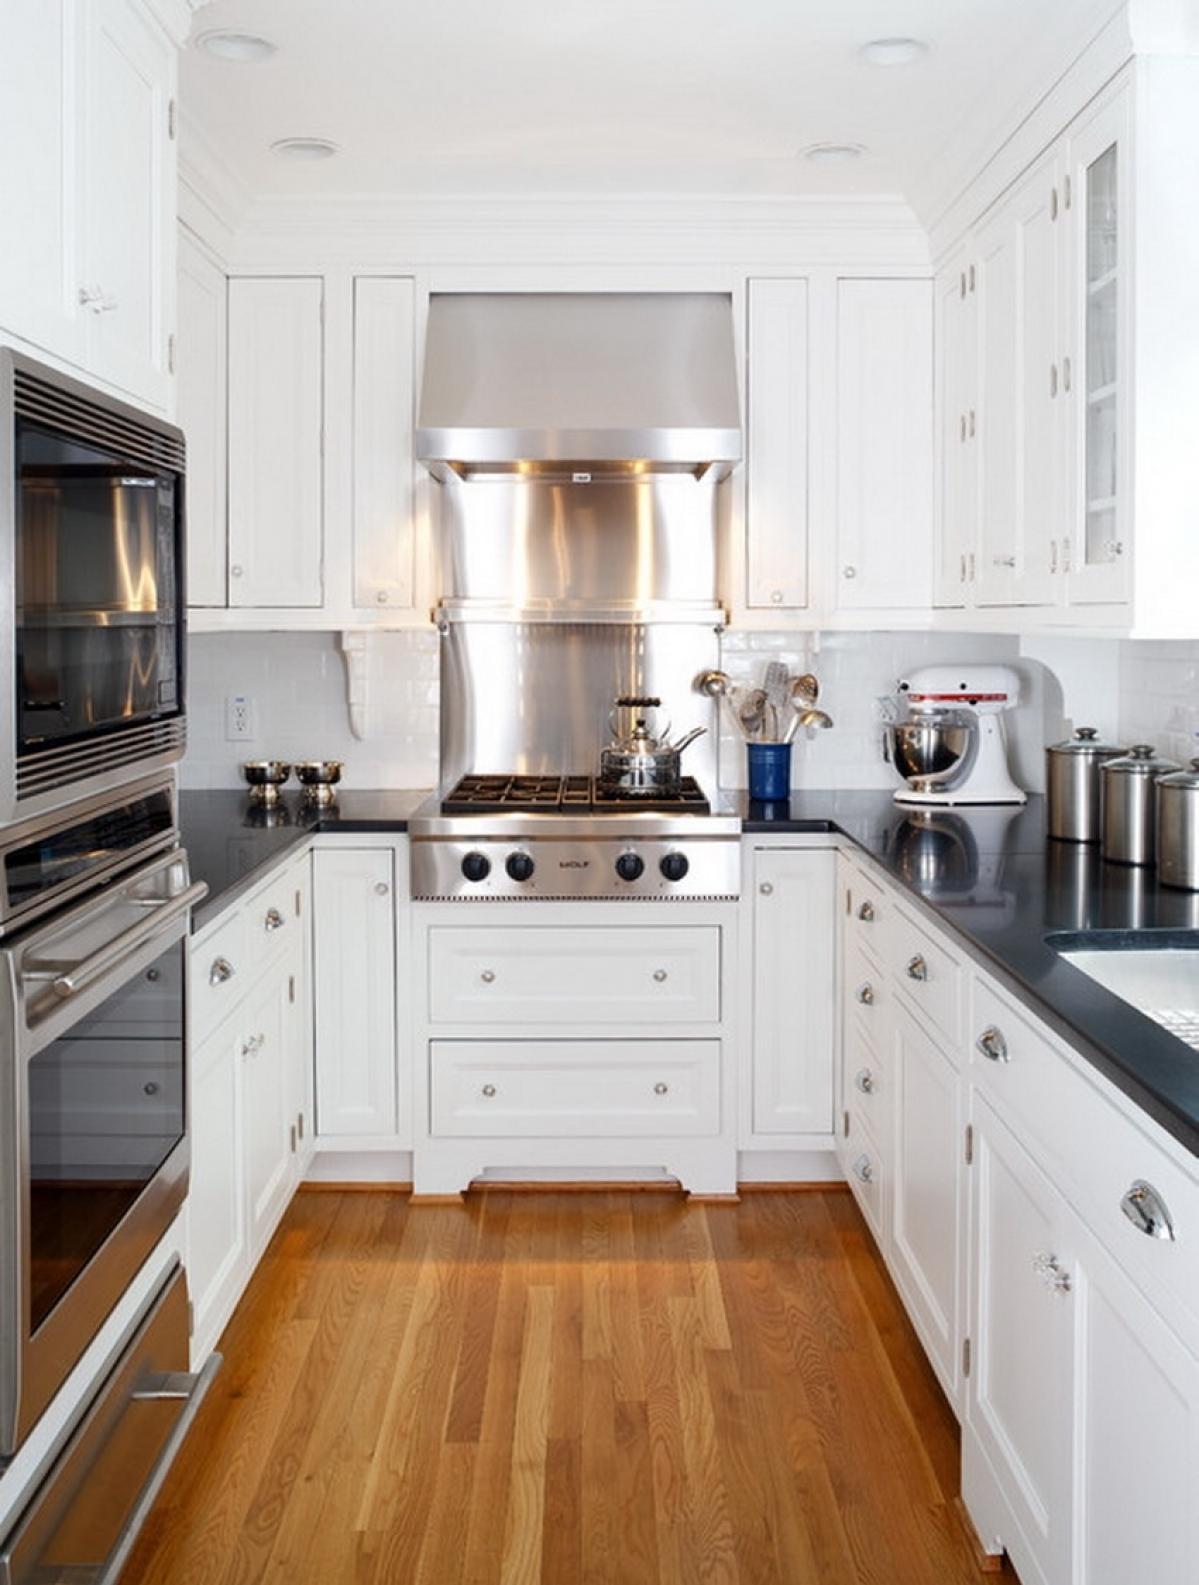 Узкая черно-белая кухня